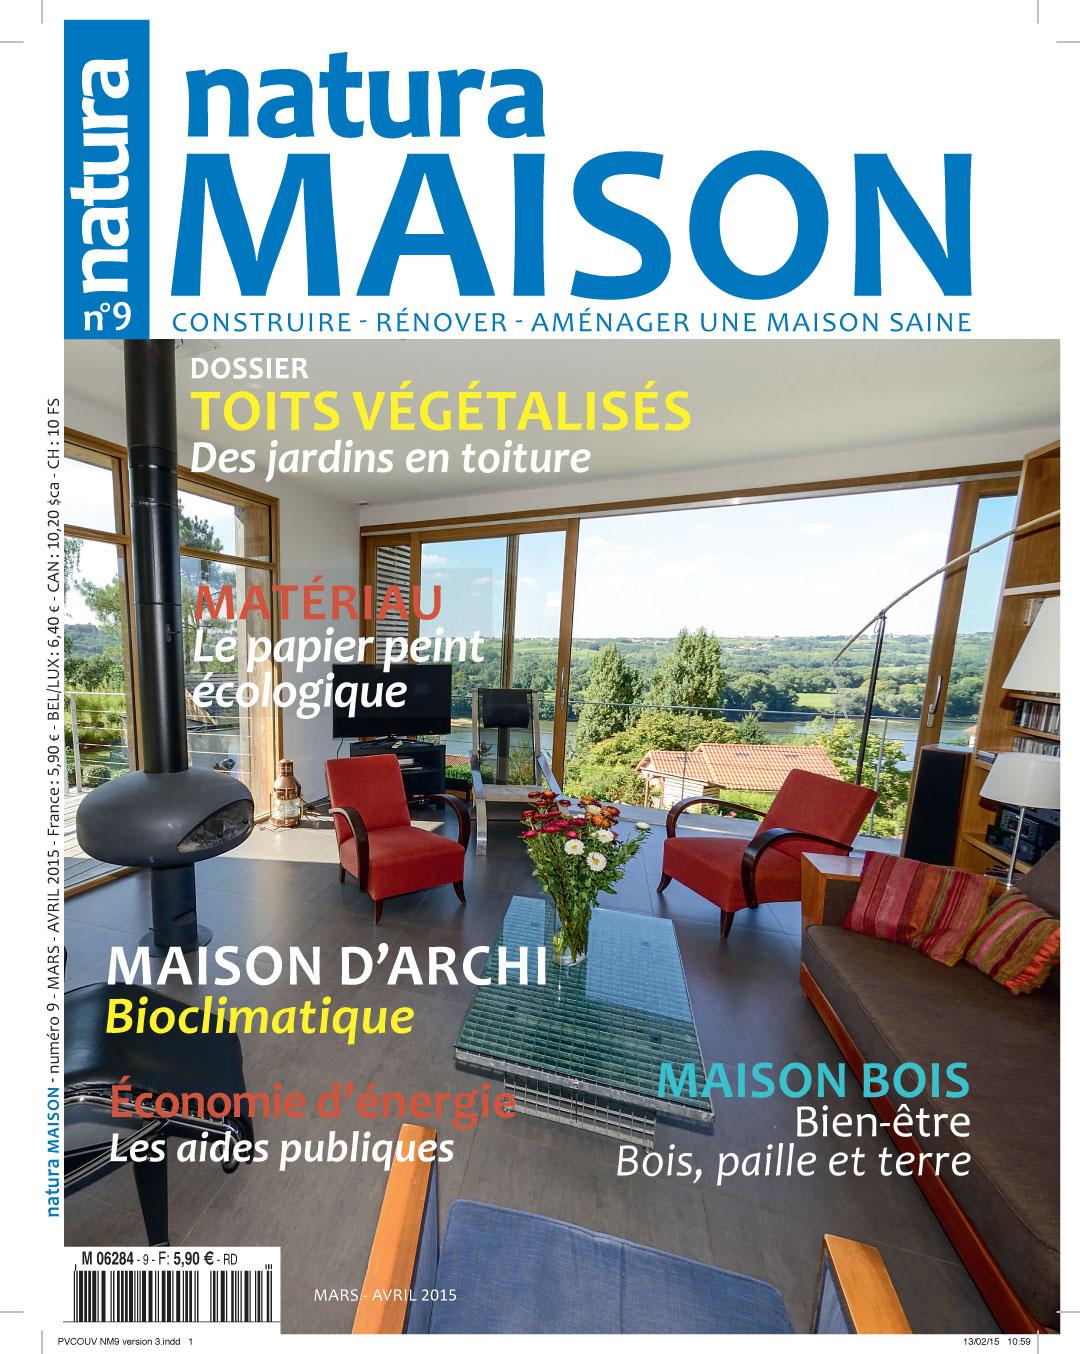 Une magazine Natura Maison